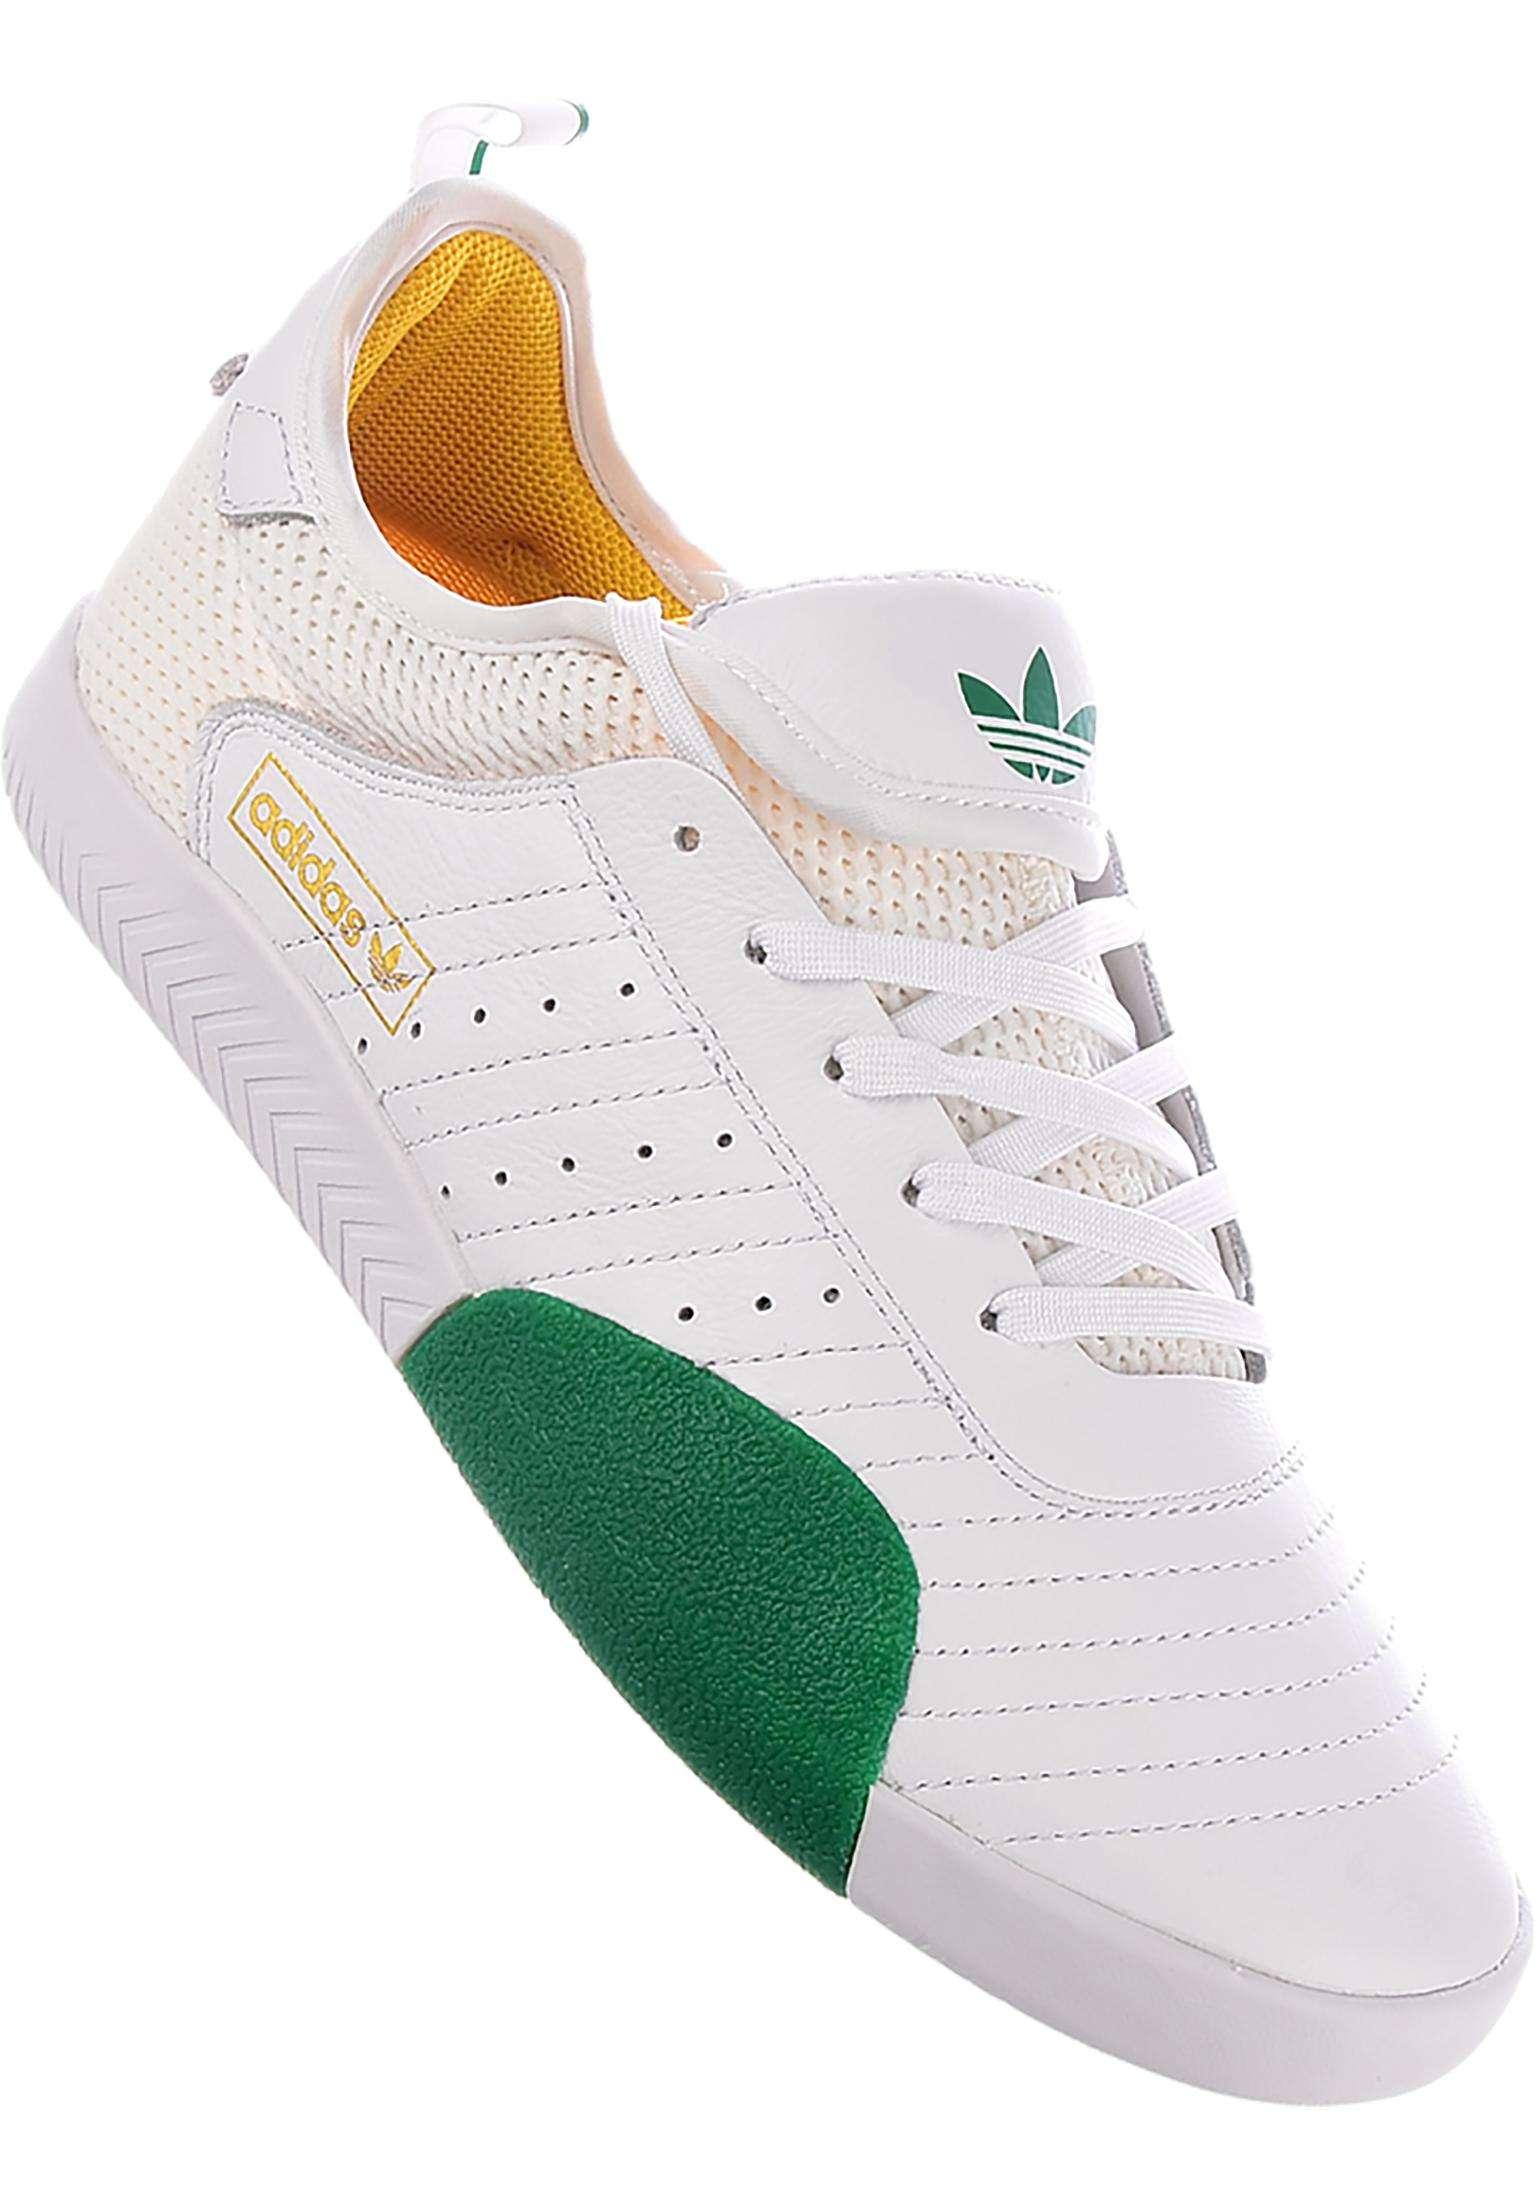 finest selection bc3d7 a70f3 adidas 3st 003 x na kel skate